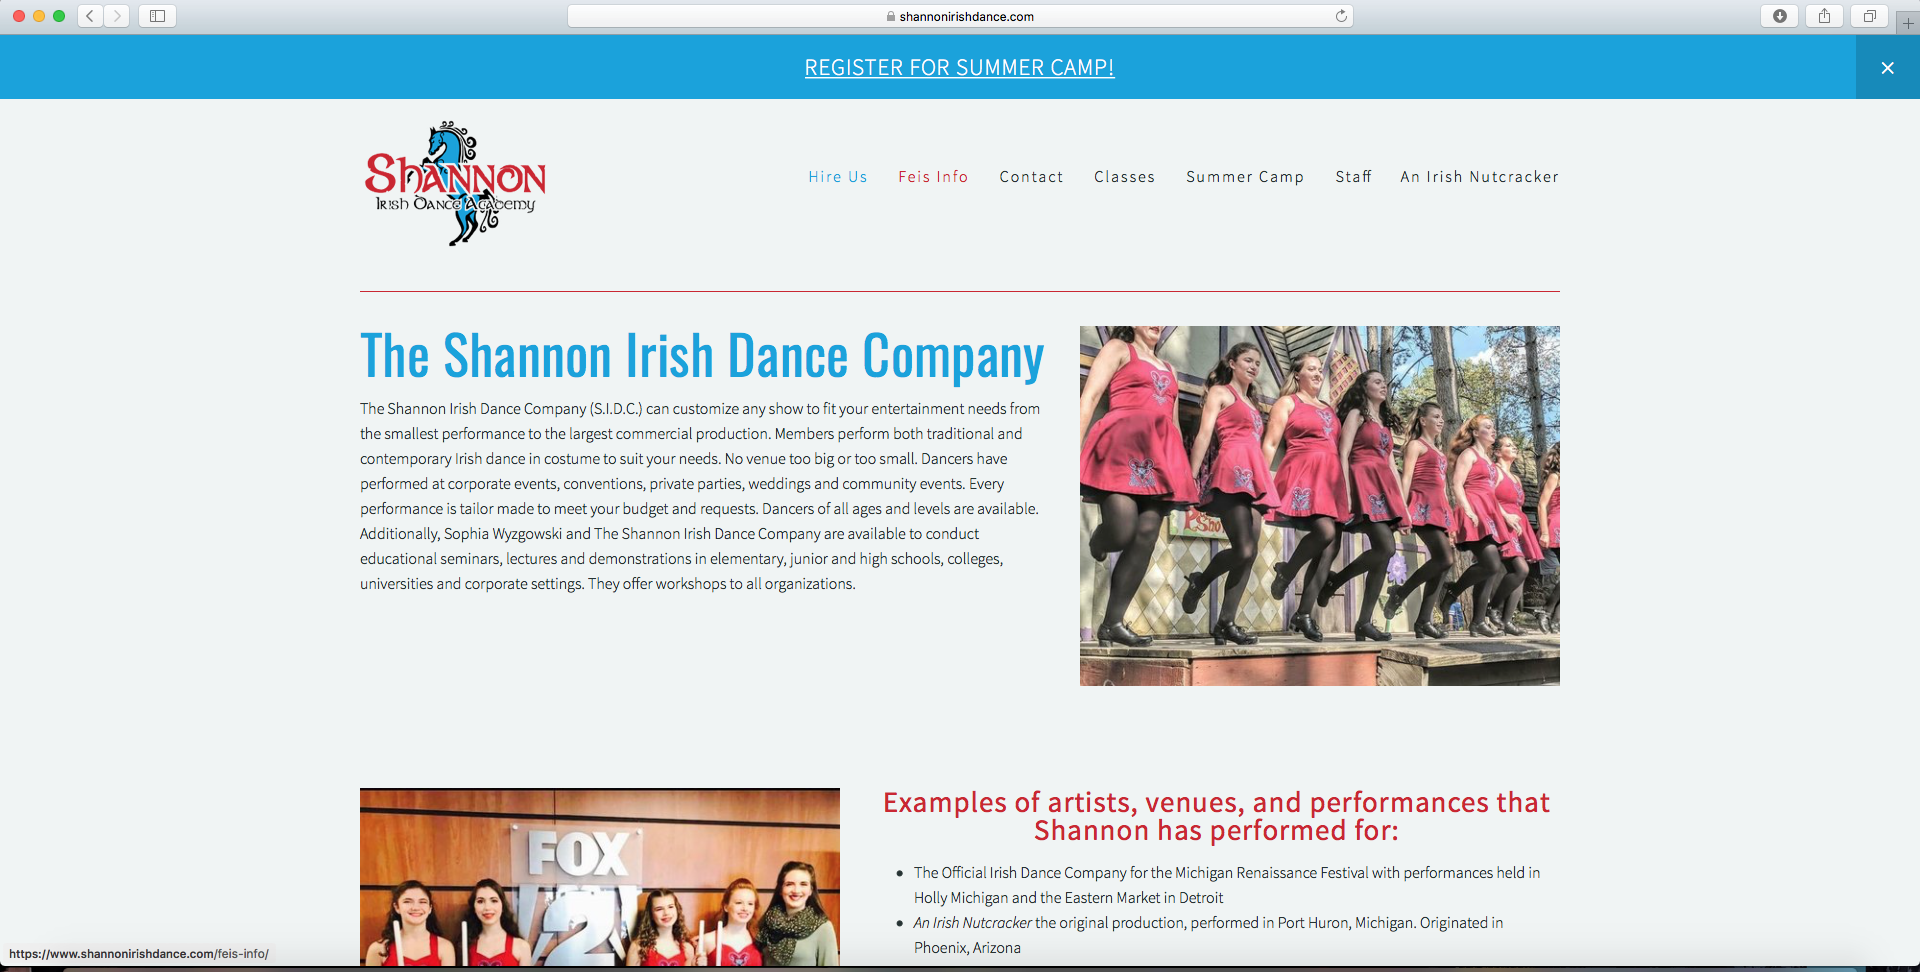 ShannonIrishDance.com